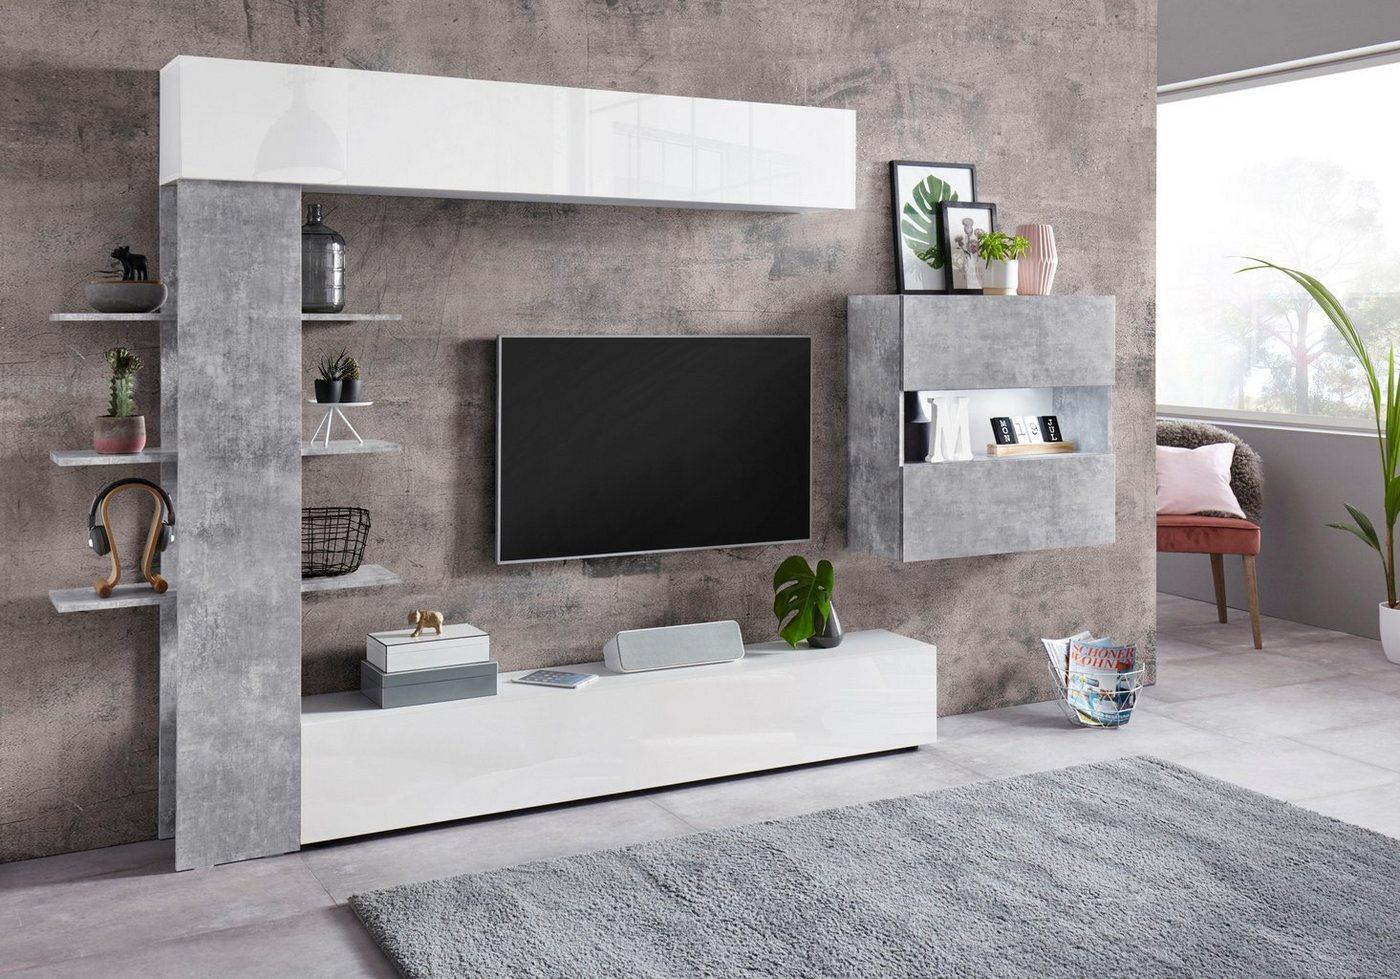 LC TV-Wand »Sorano« mit Hängeschrank (4-tlg.) - LC